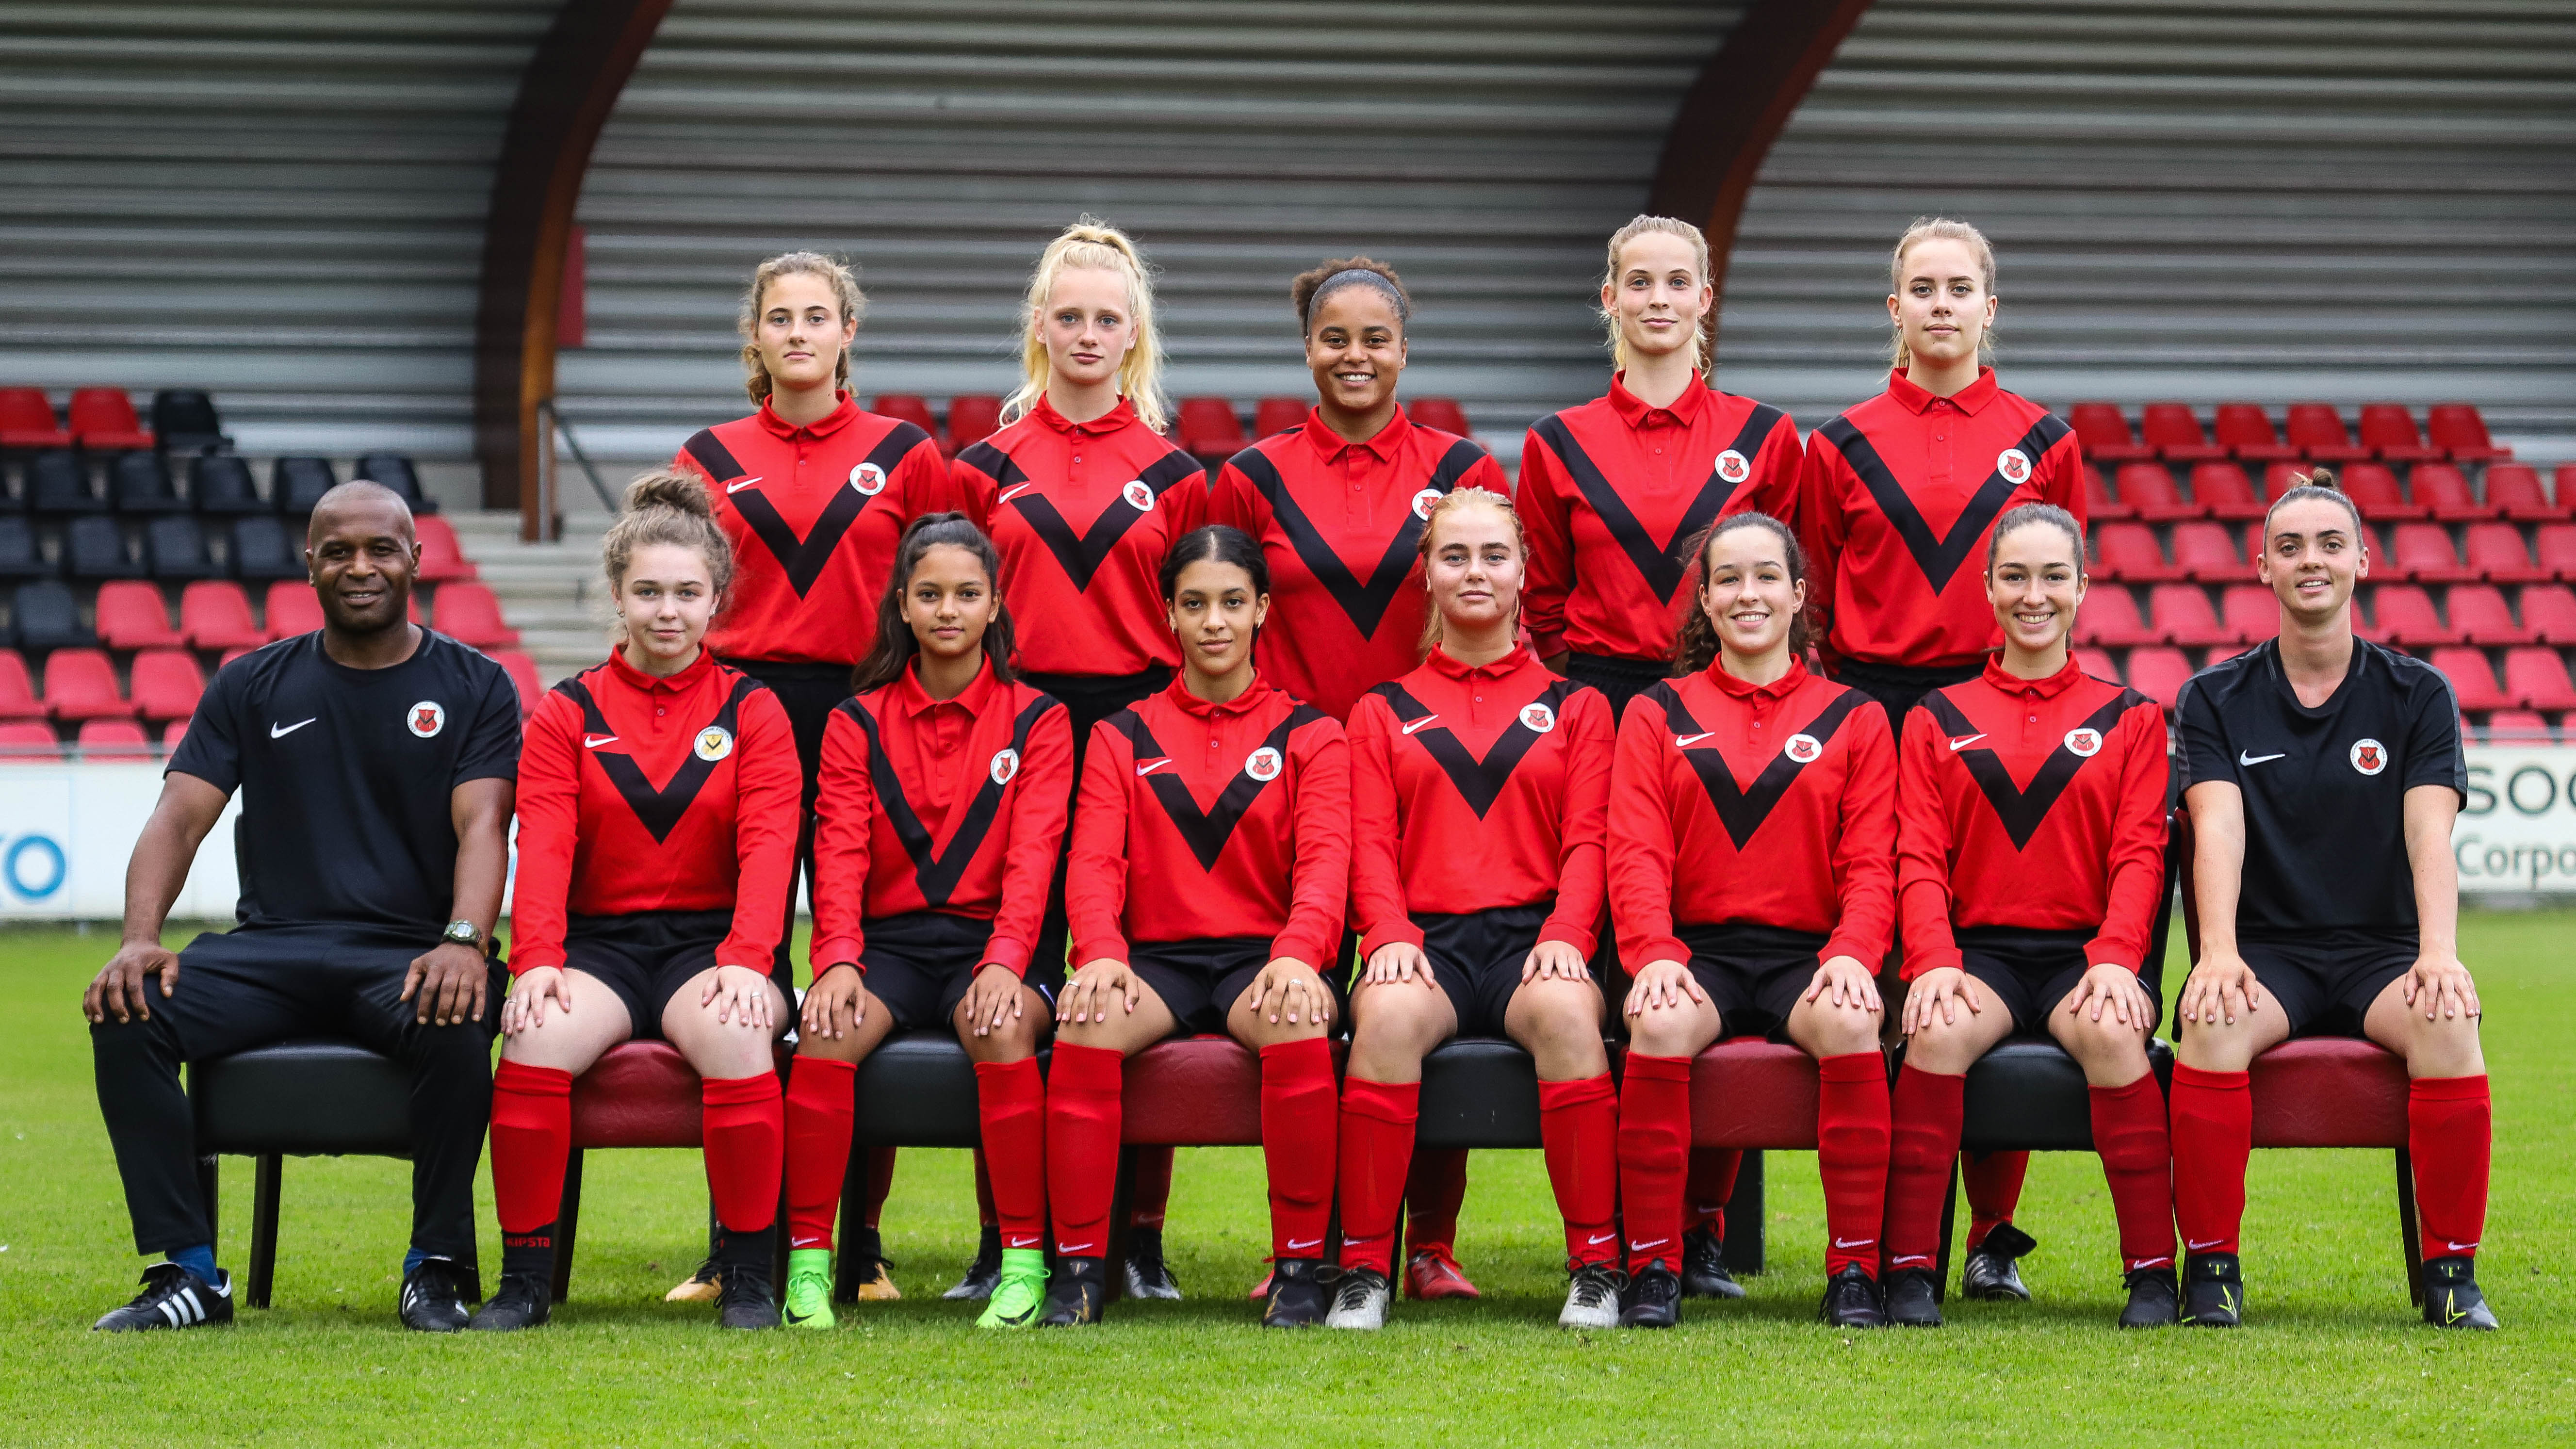 Teamfoto AFC Vrouwen 1